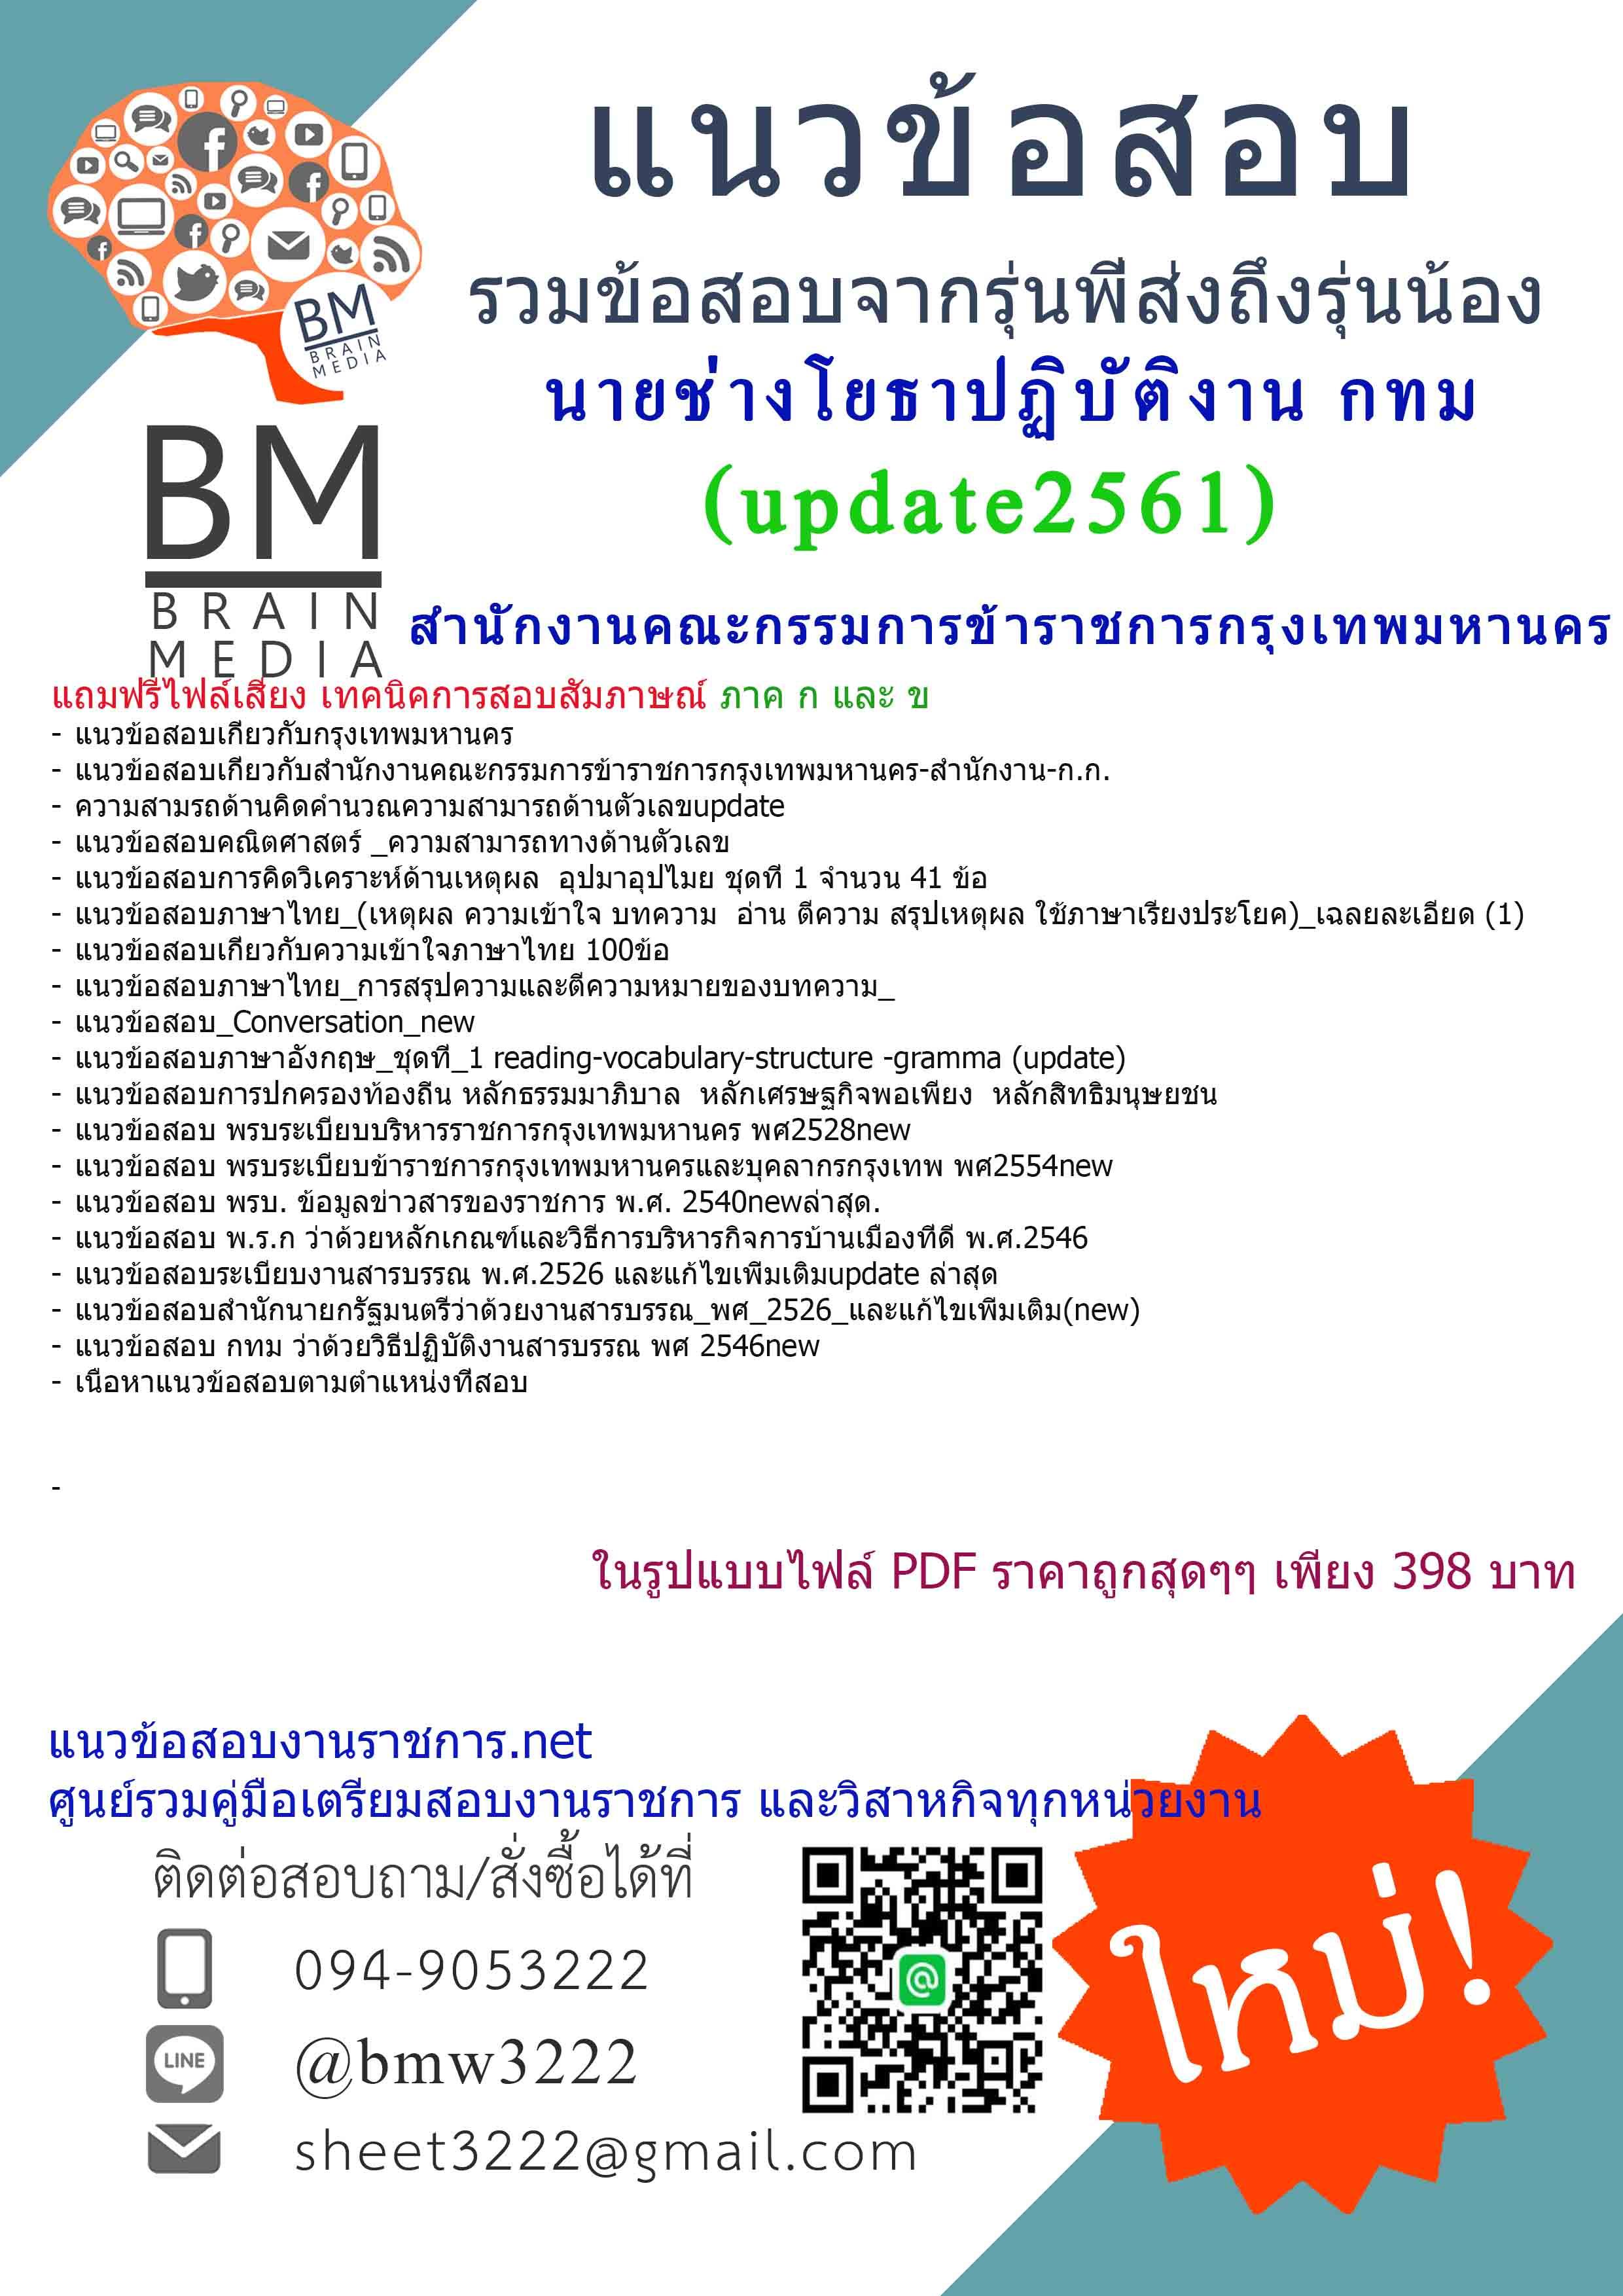 (((newupdateที่สุด)))แนวข้อสอบนายช่างโยธาปฏิบัติงานข้าราชการกรุงเทพมหานคร(กทม.)สำนักงานคณะกรรมการข้าราชการกรุงเทพมหานคร(สำนักงานก.ก.)2561